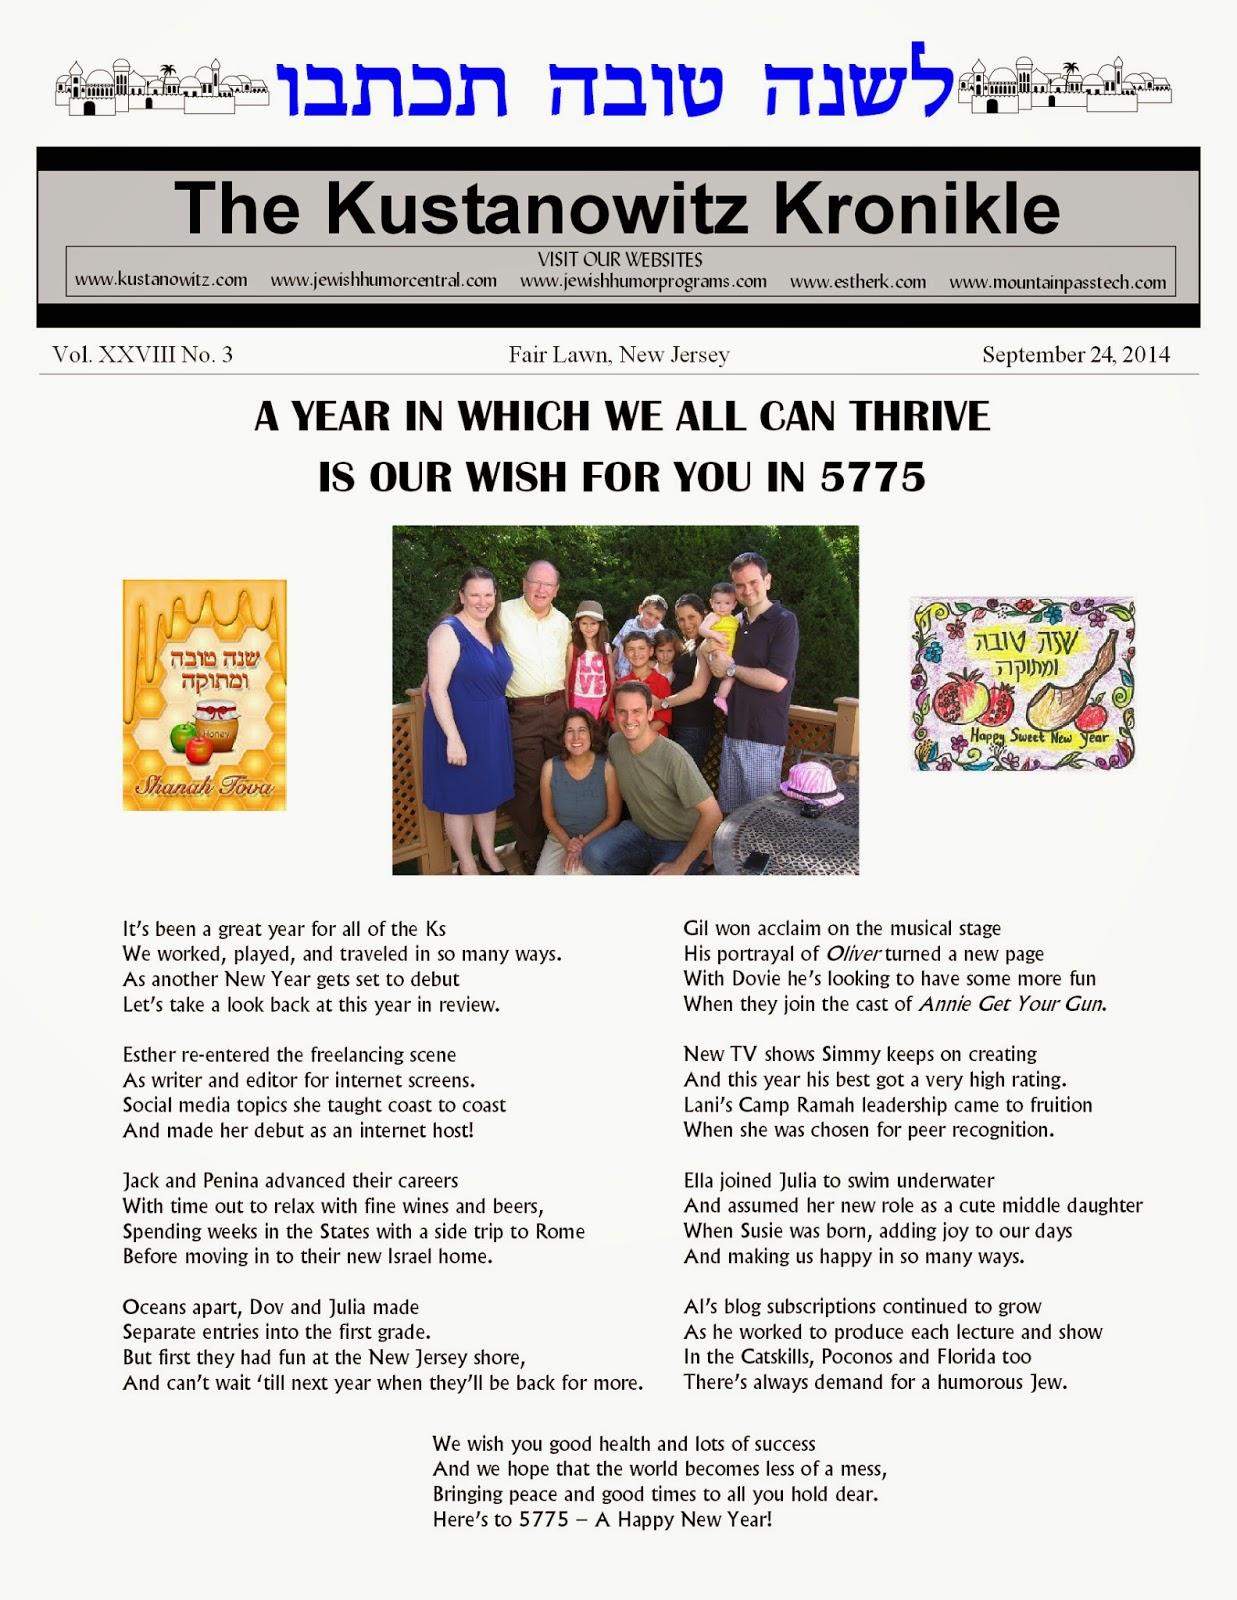 http://www.kustanowitz.com/kronrh14.pdf